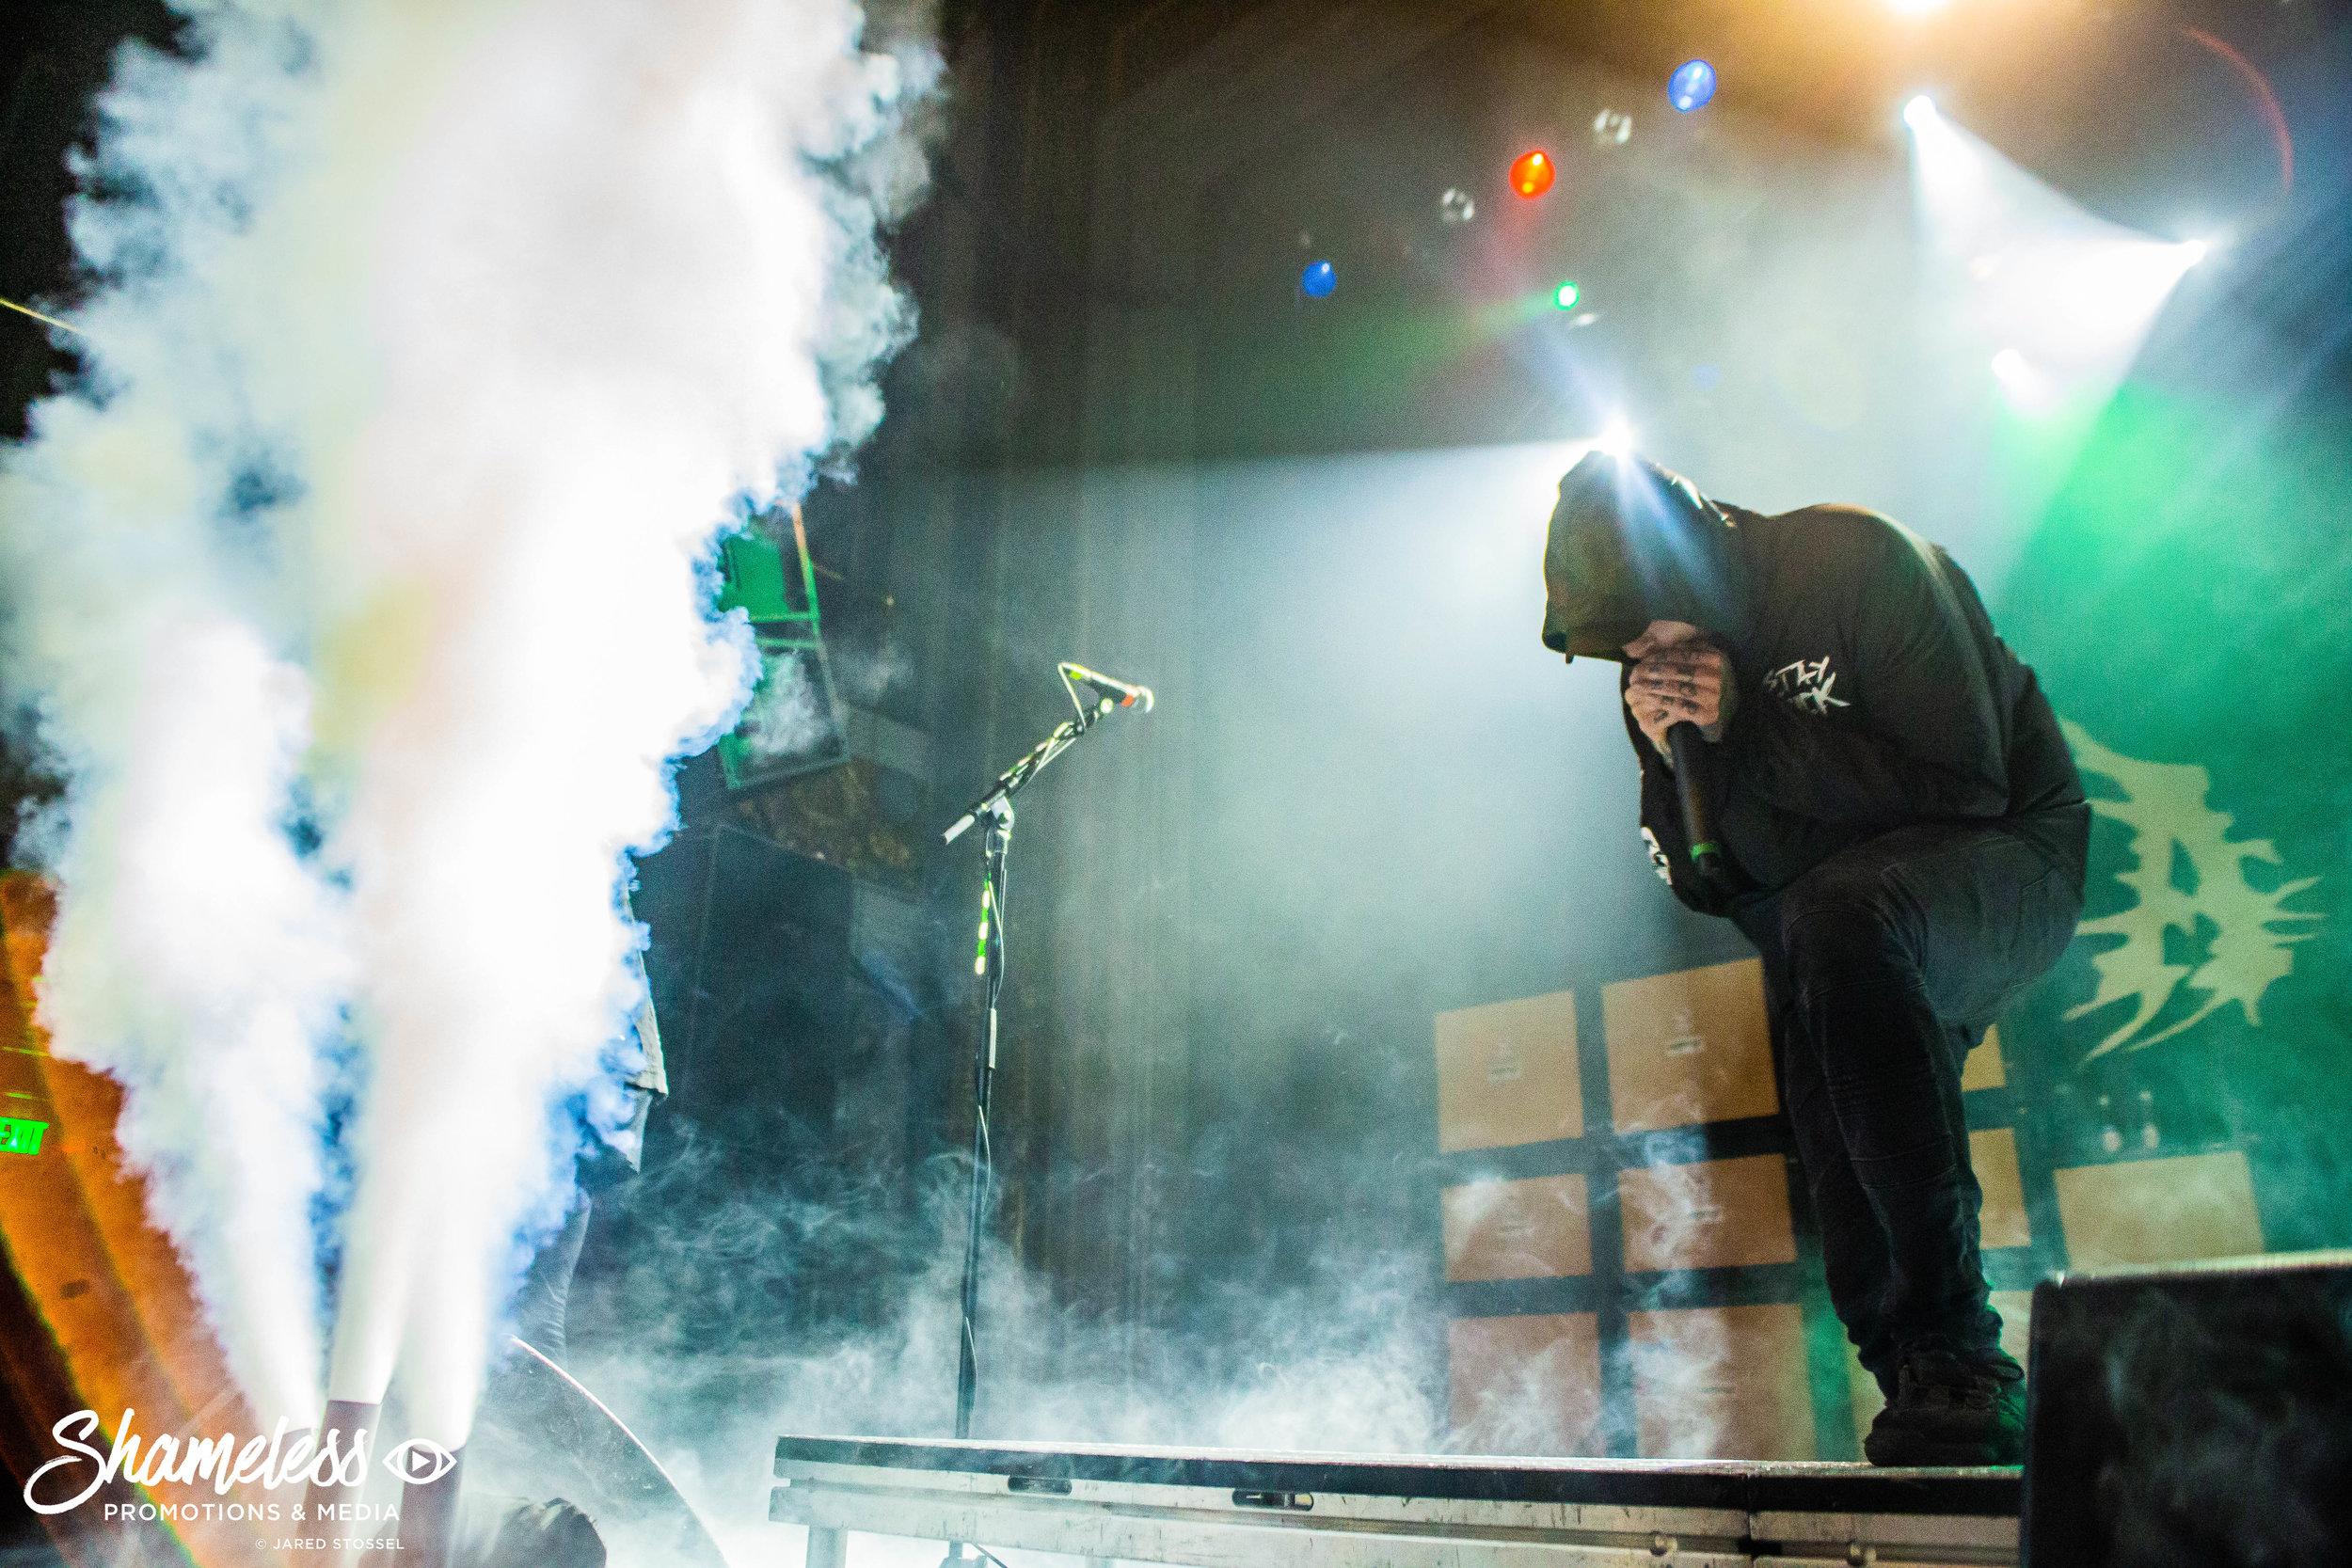 Attila 'Rage Fest' Tour @ The Regency Ballroom: August 2018